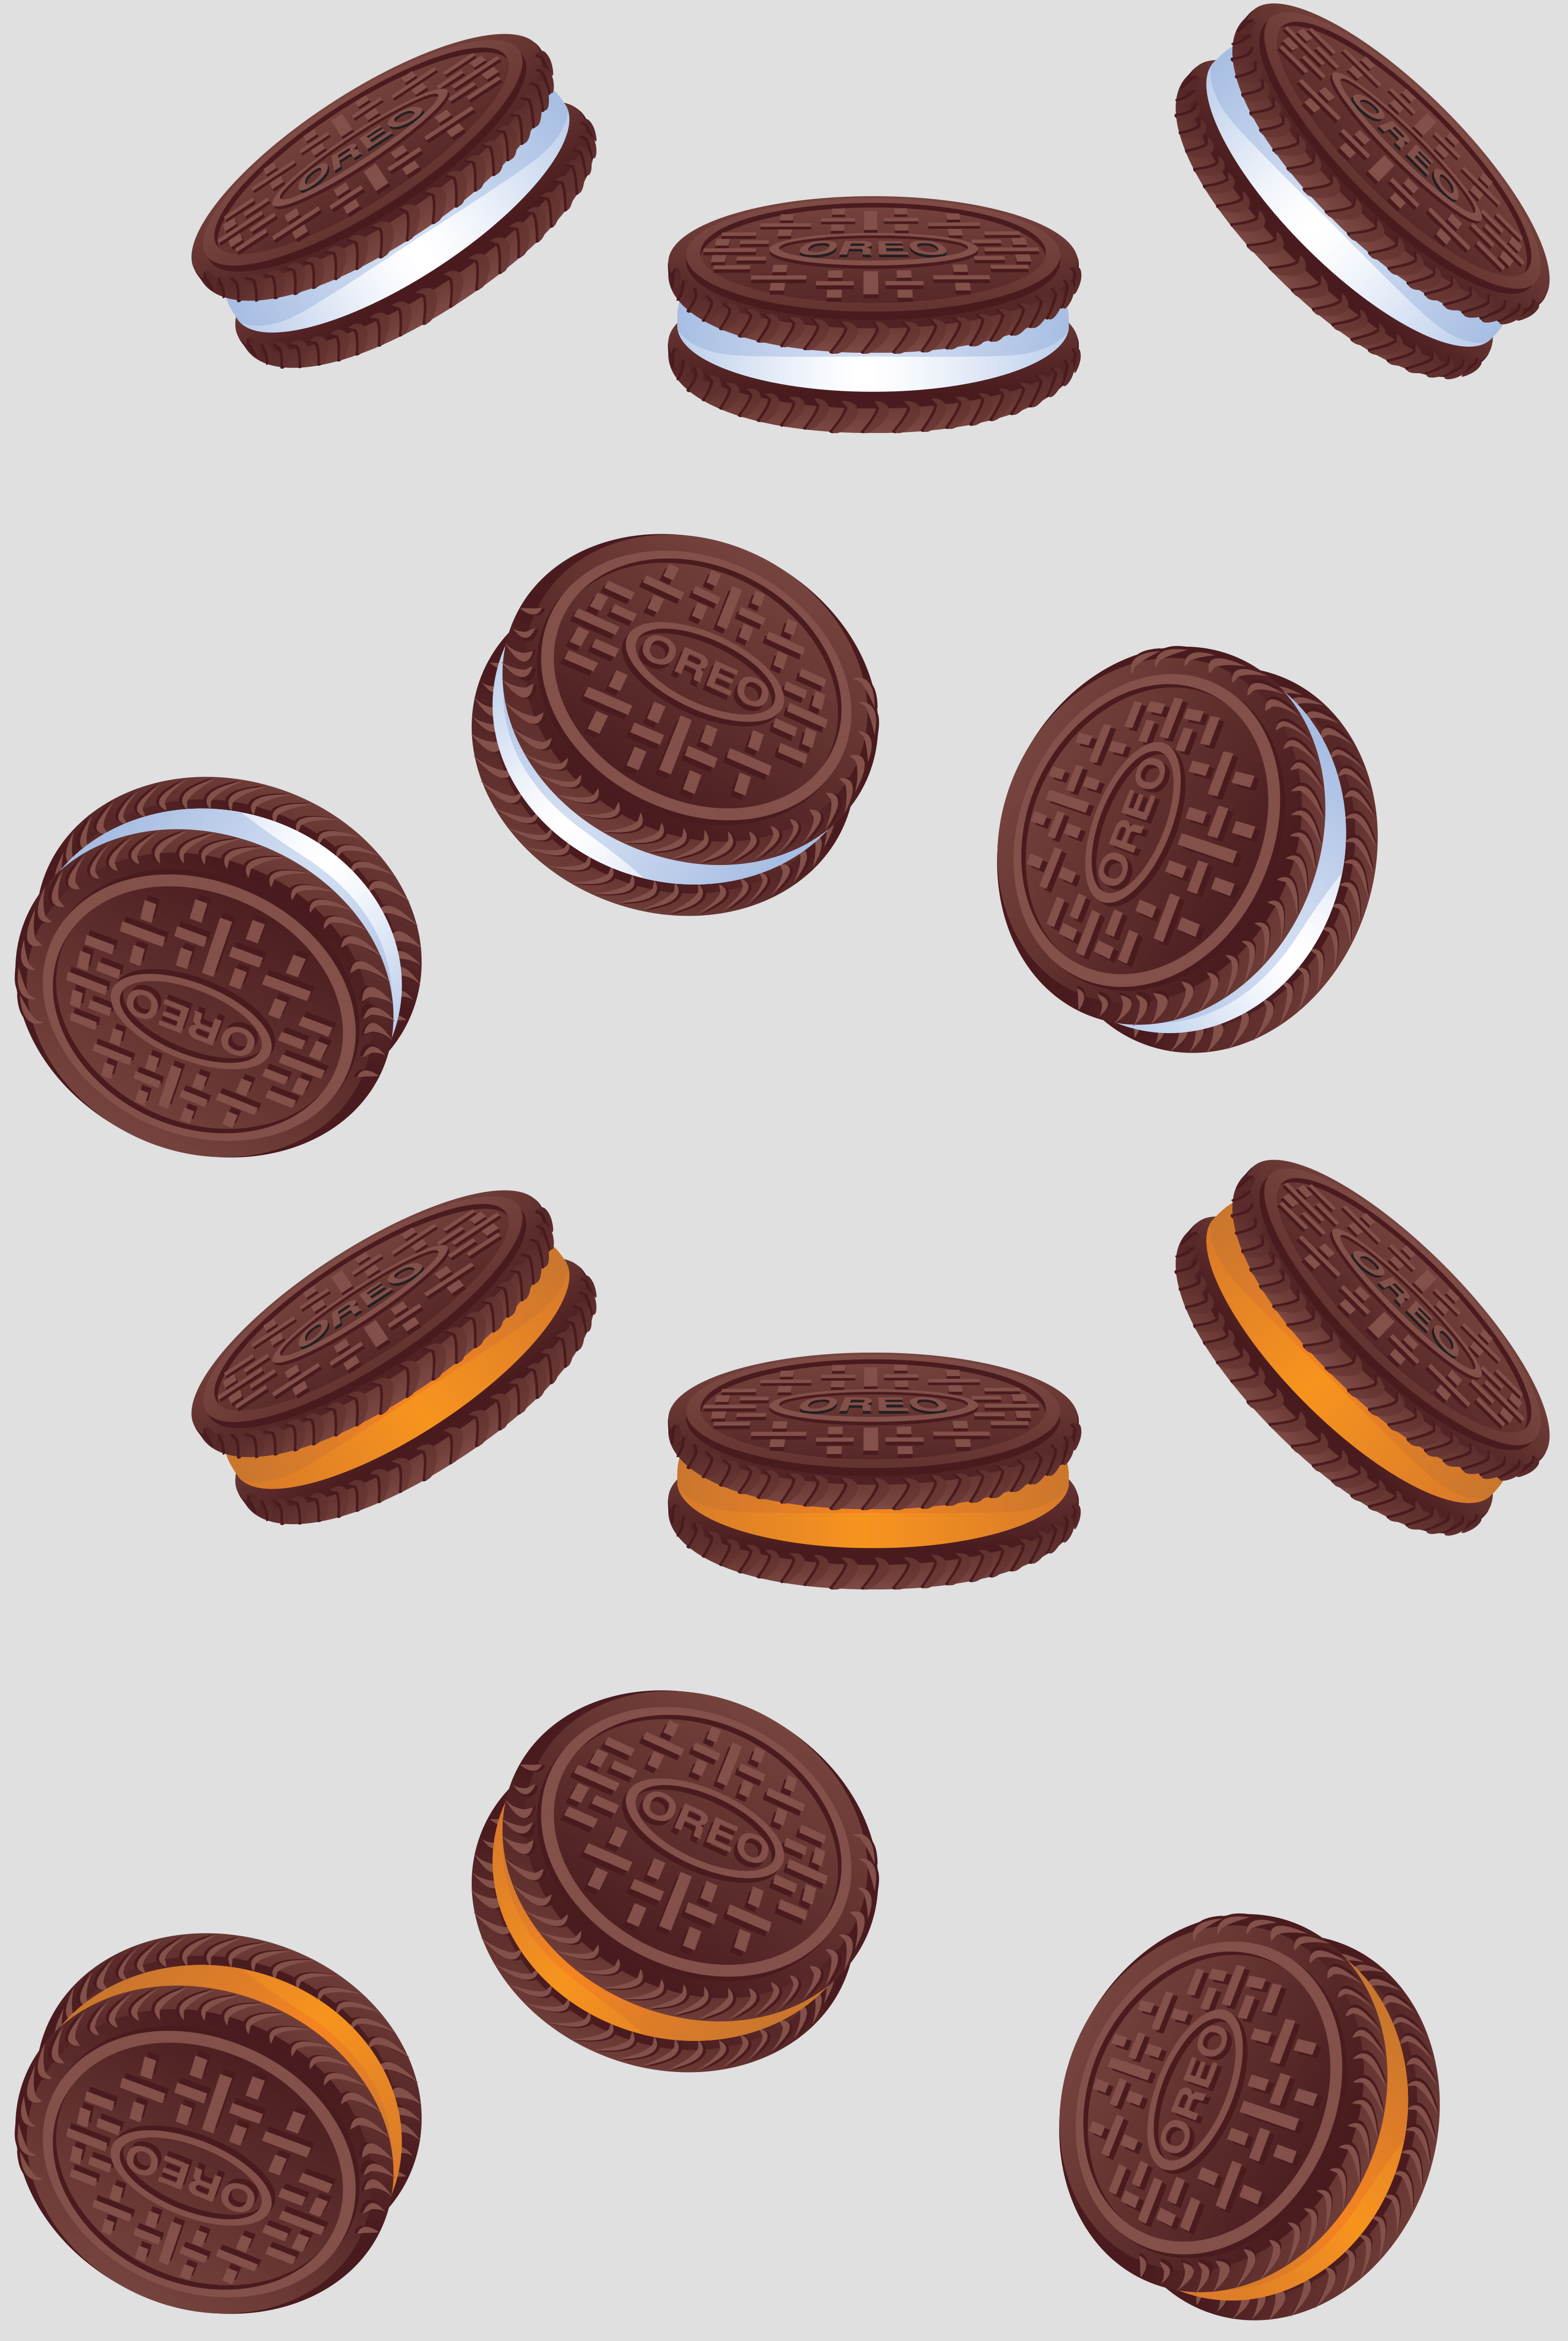 Oreo Cookies Illustration